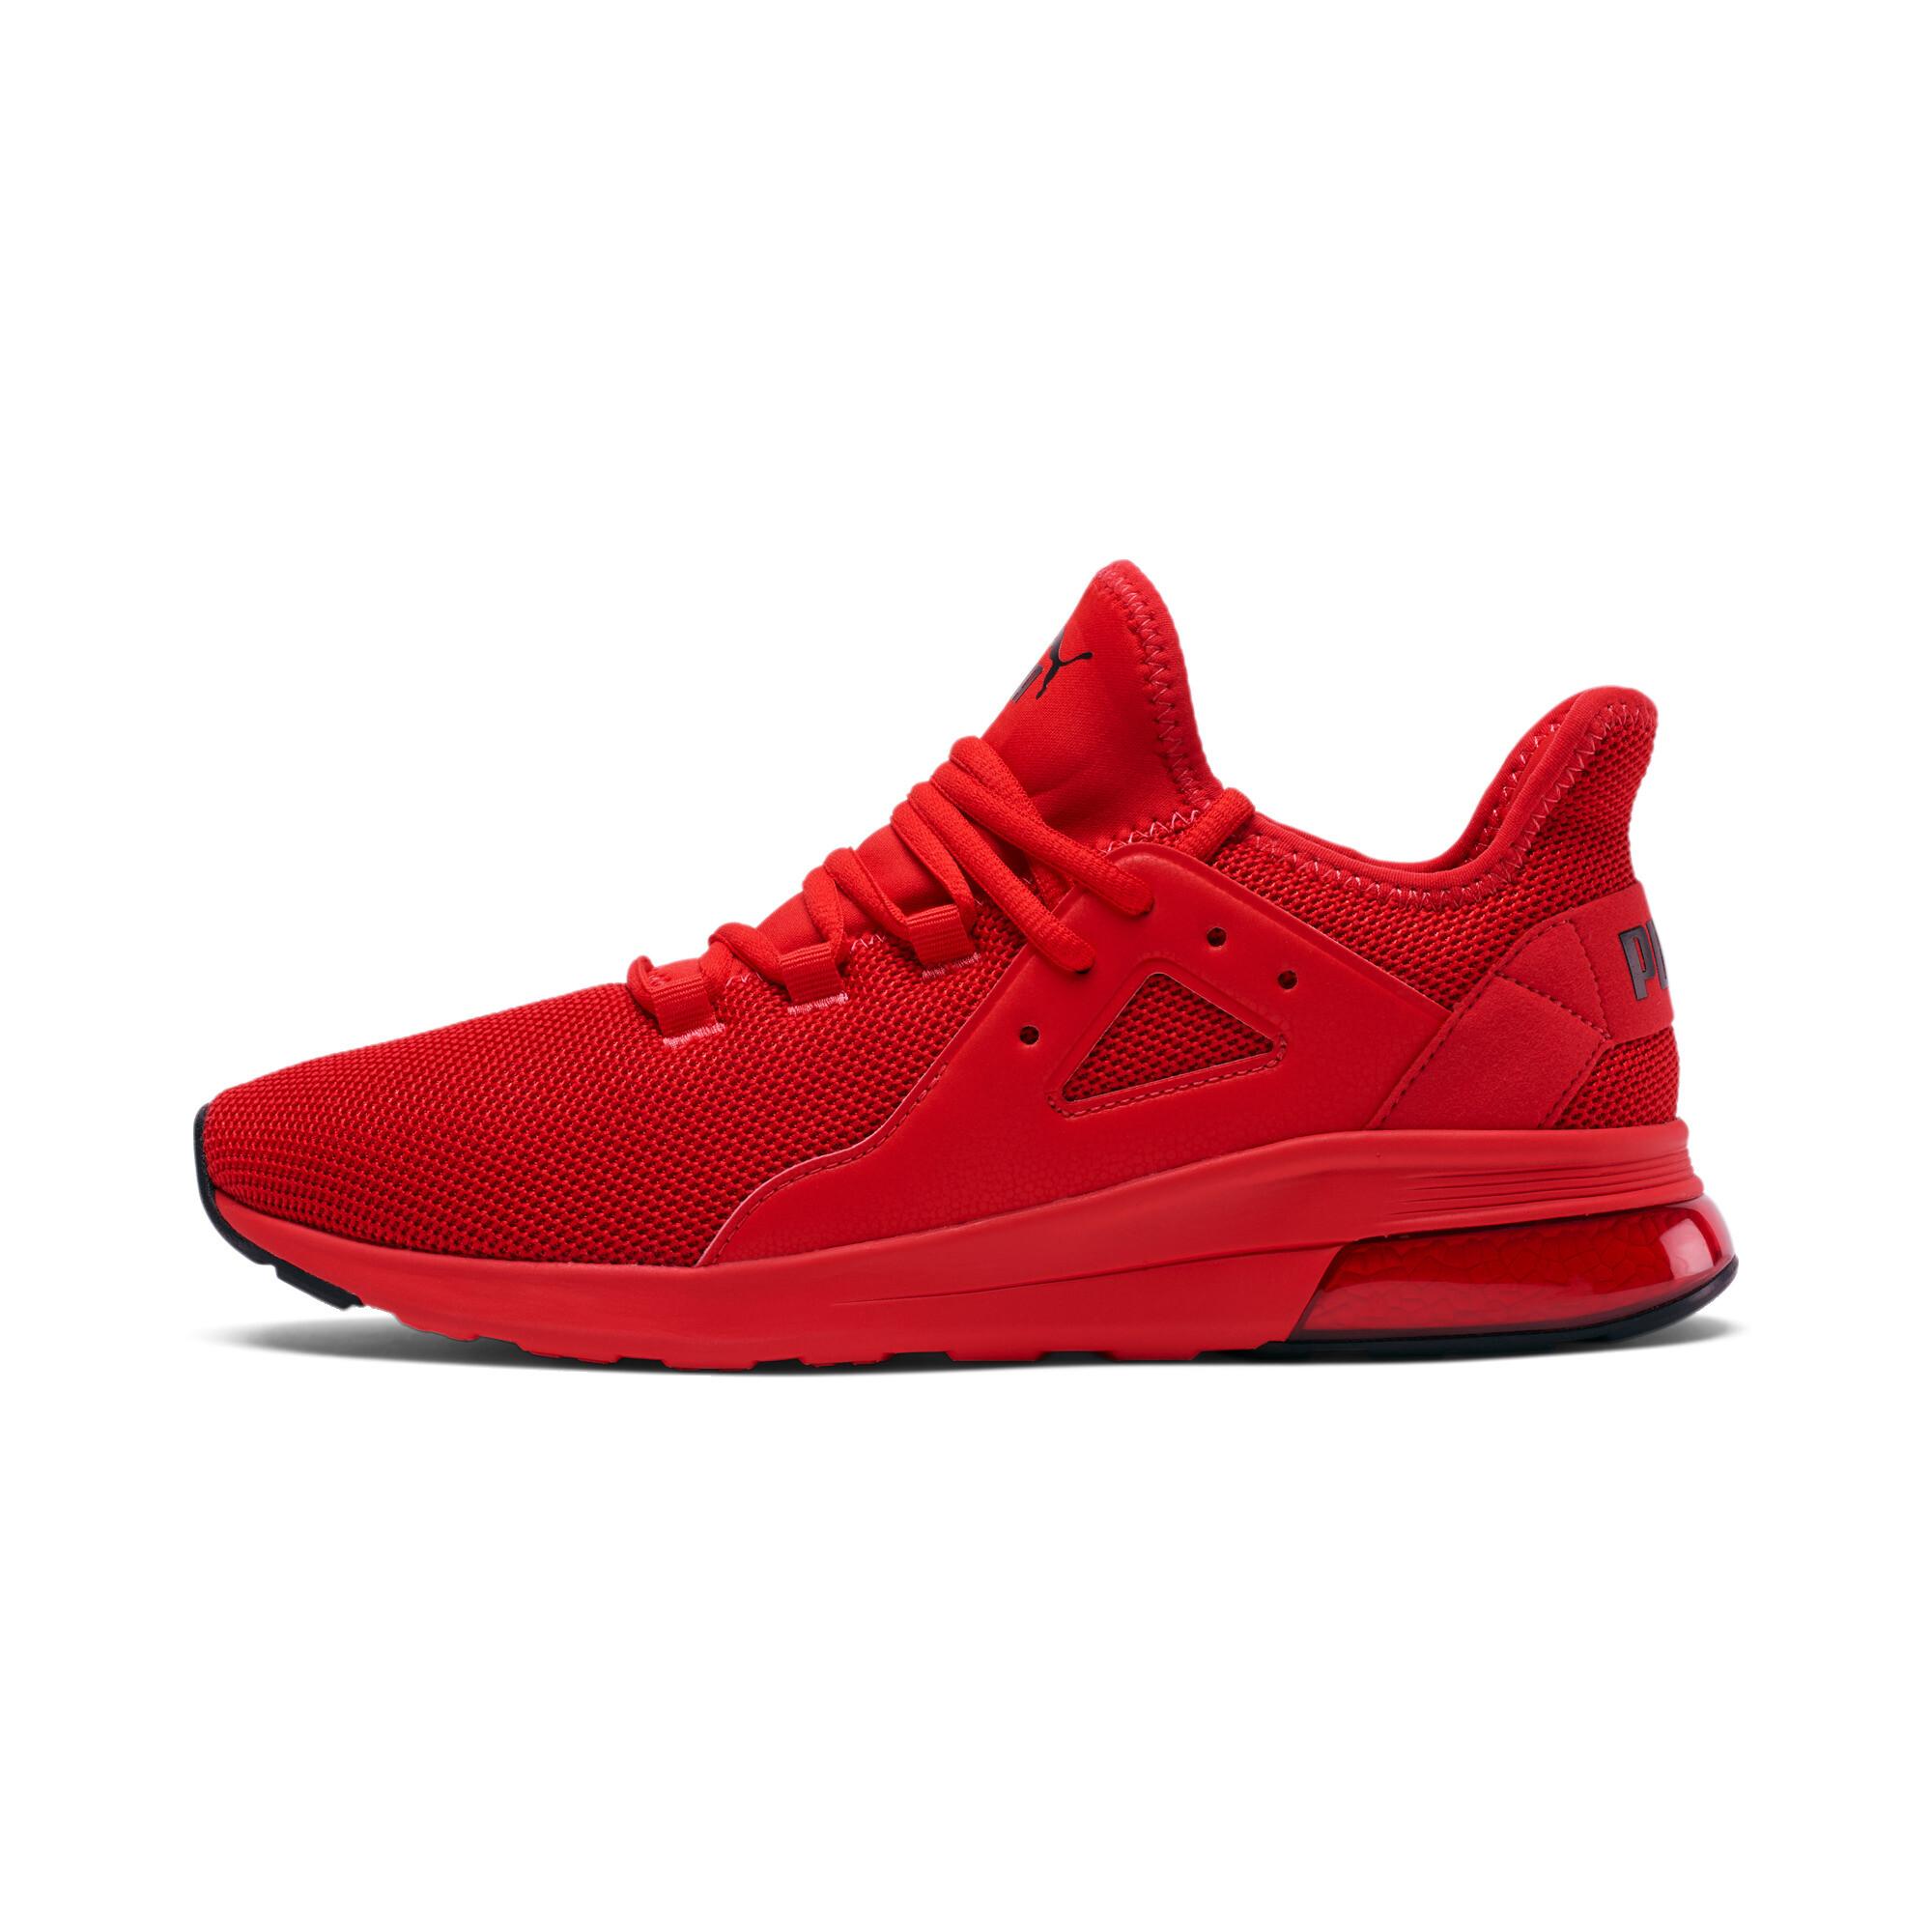 PUMA-Men-039-s-Electron-Street-Sneakers thumbnail 31